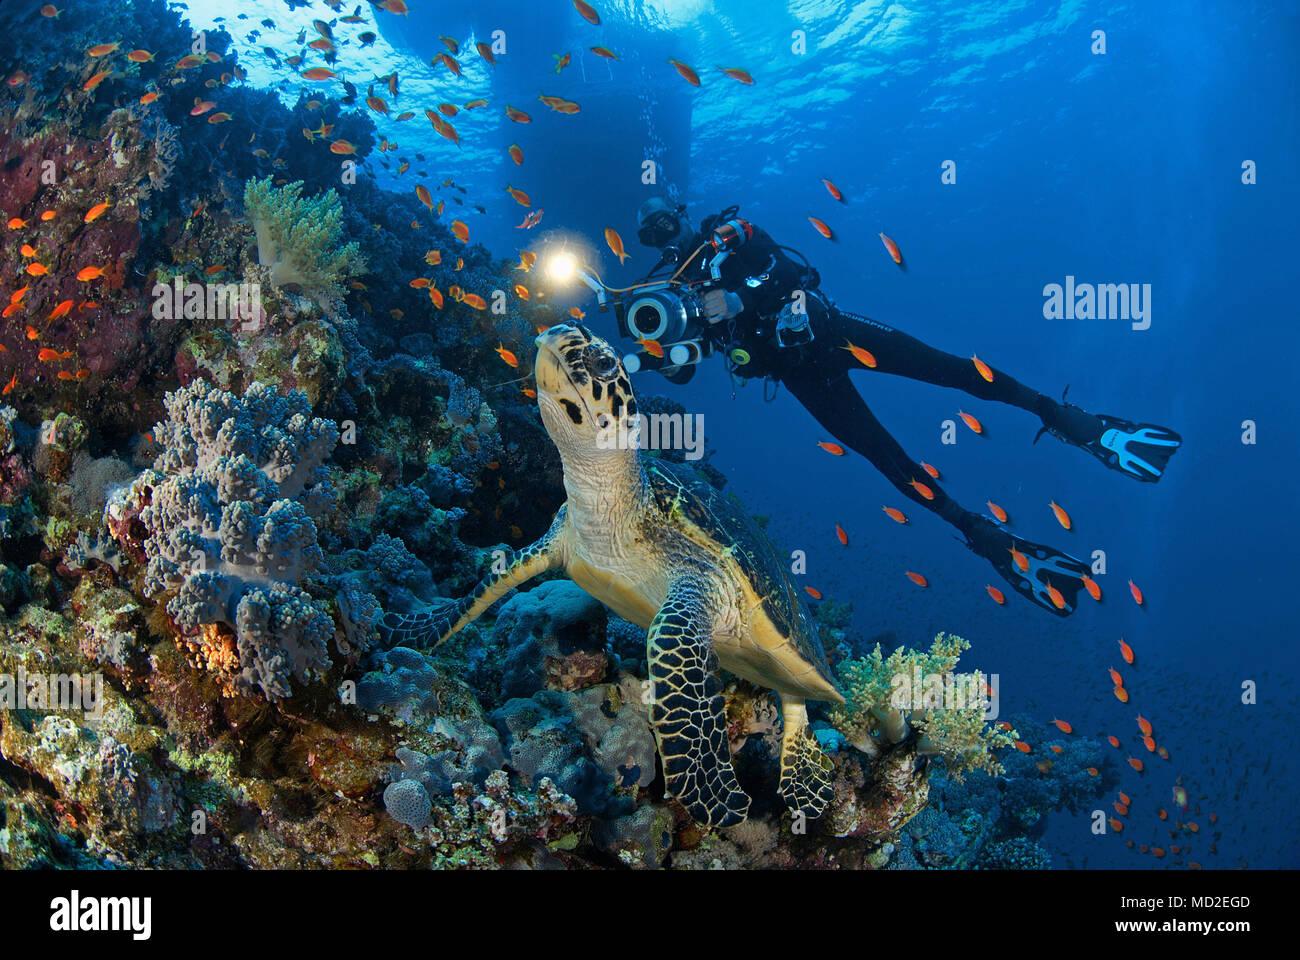 Scuba diver and a Green sea turtle (Chelonia mydas) at a coral reef, Borneo, Malaysia Stock Photo